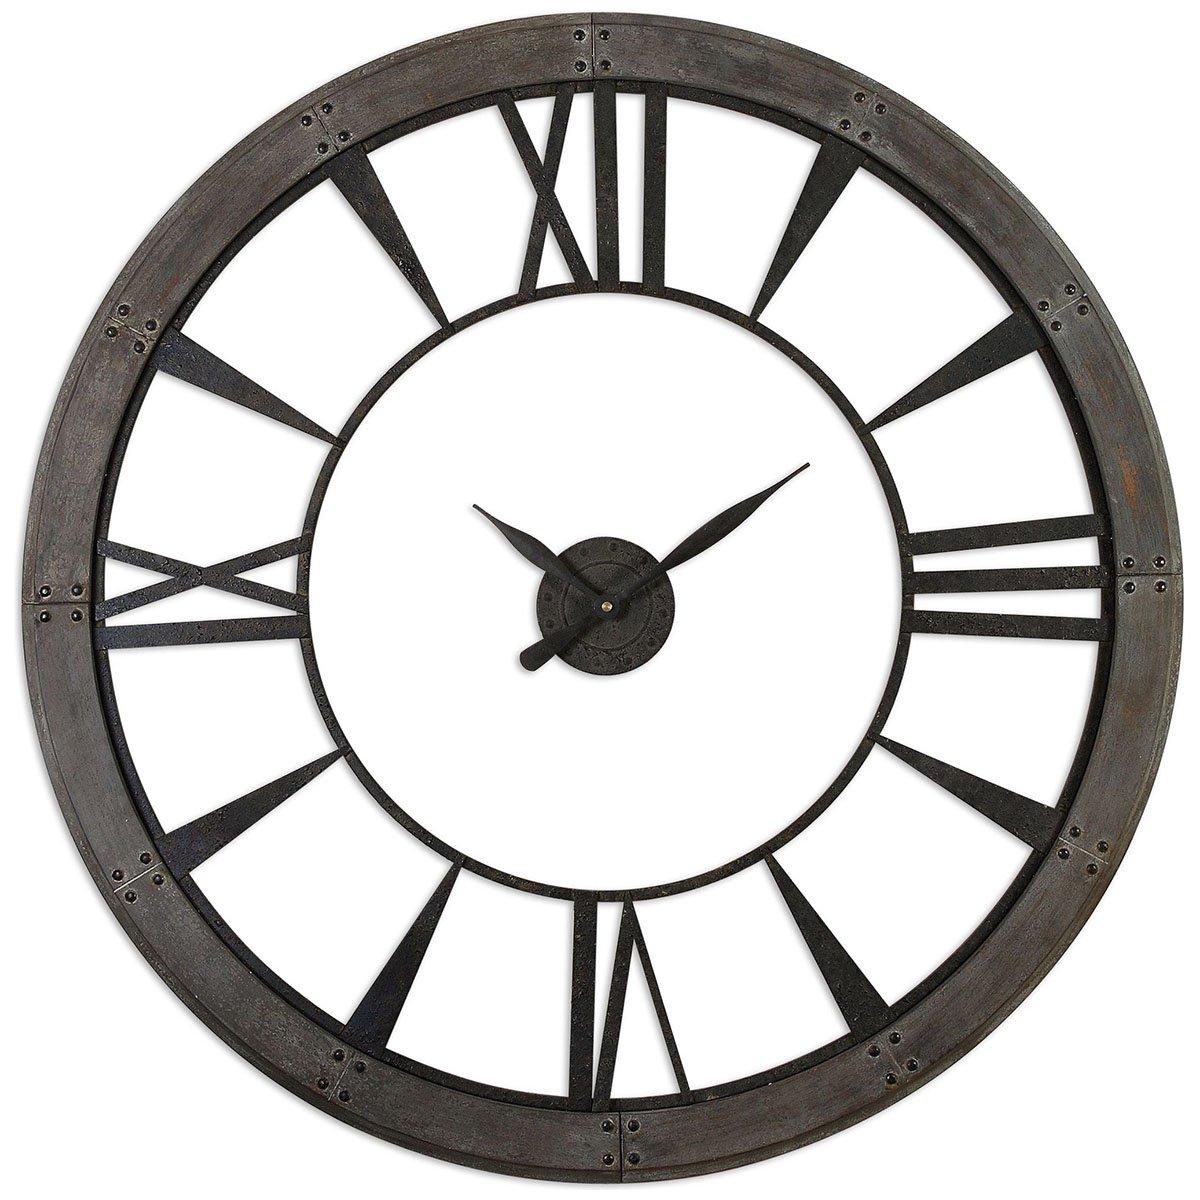 Uttermost 06084 Ronan Wall Clock, Large, Gray